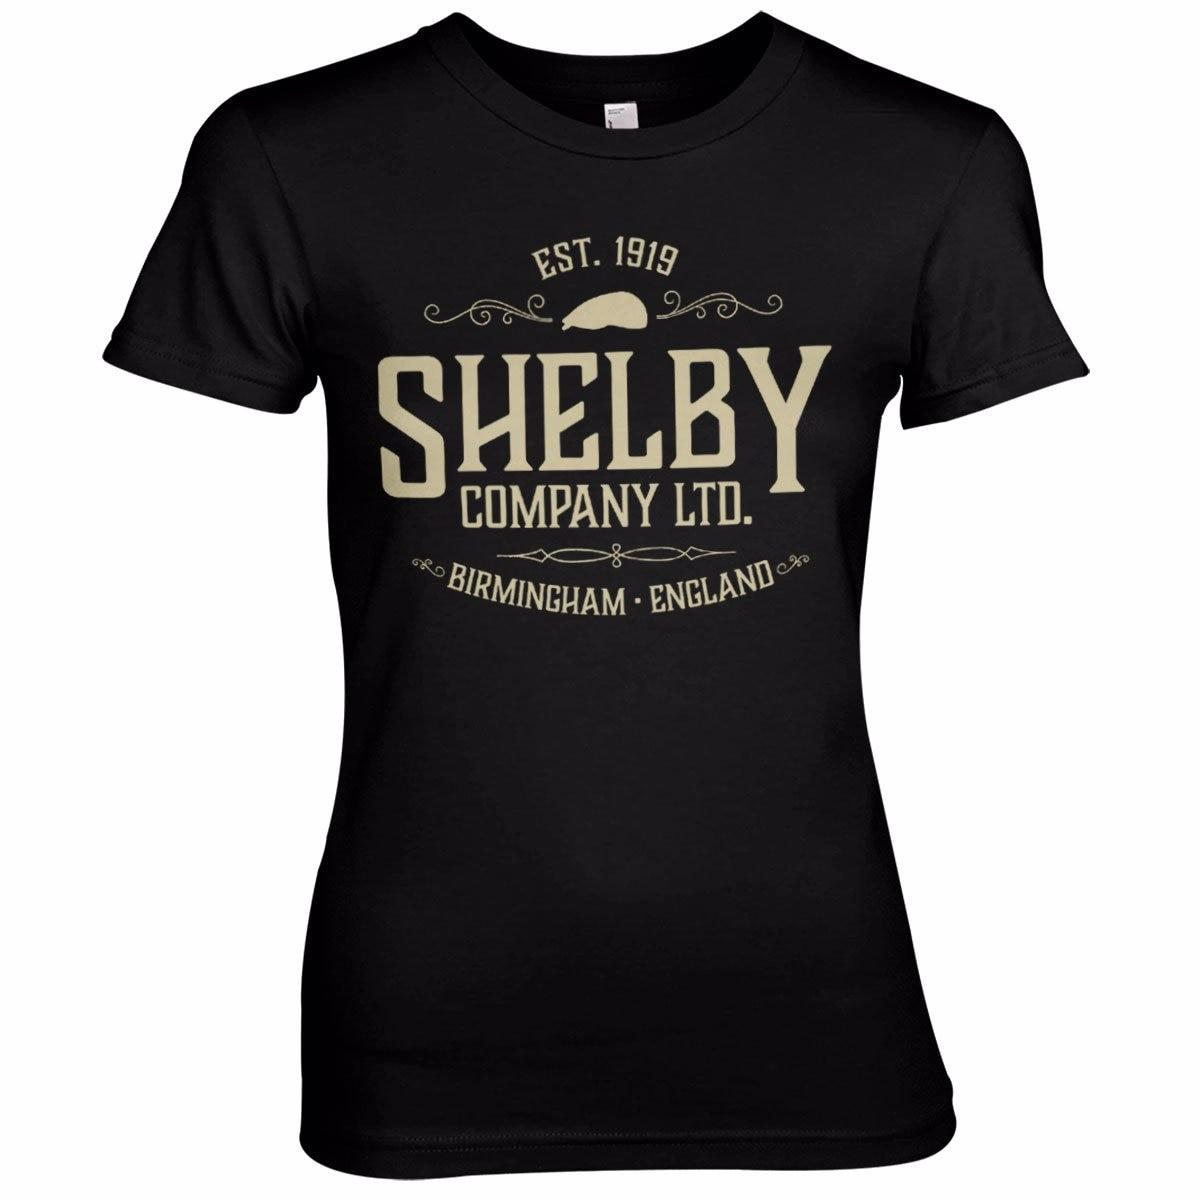 Shelby Company Limited Girly Tee